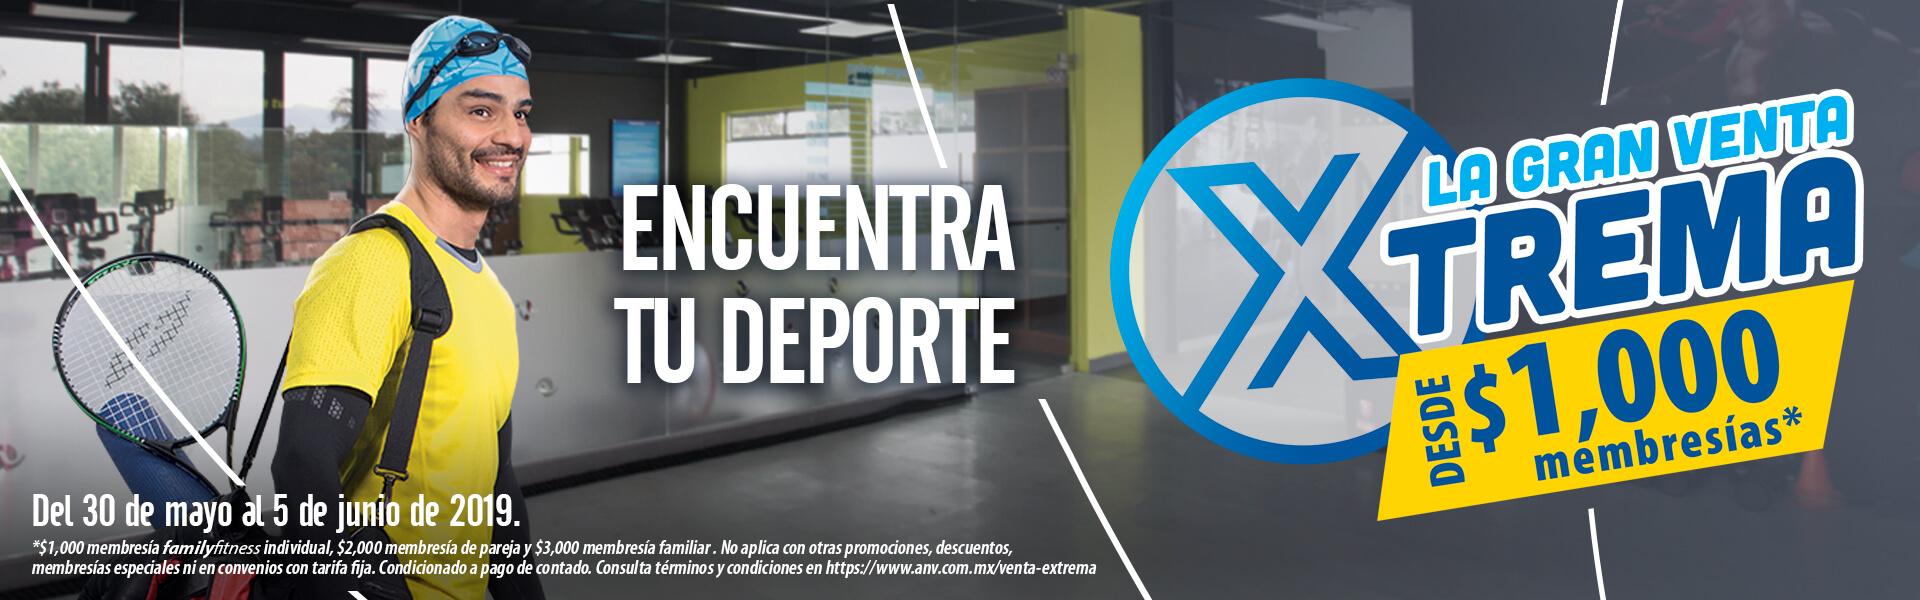 Ban Venta Xtrema1000 Nvff 1920x600